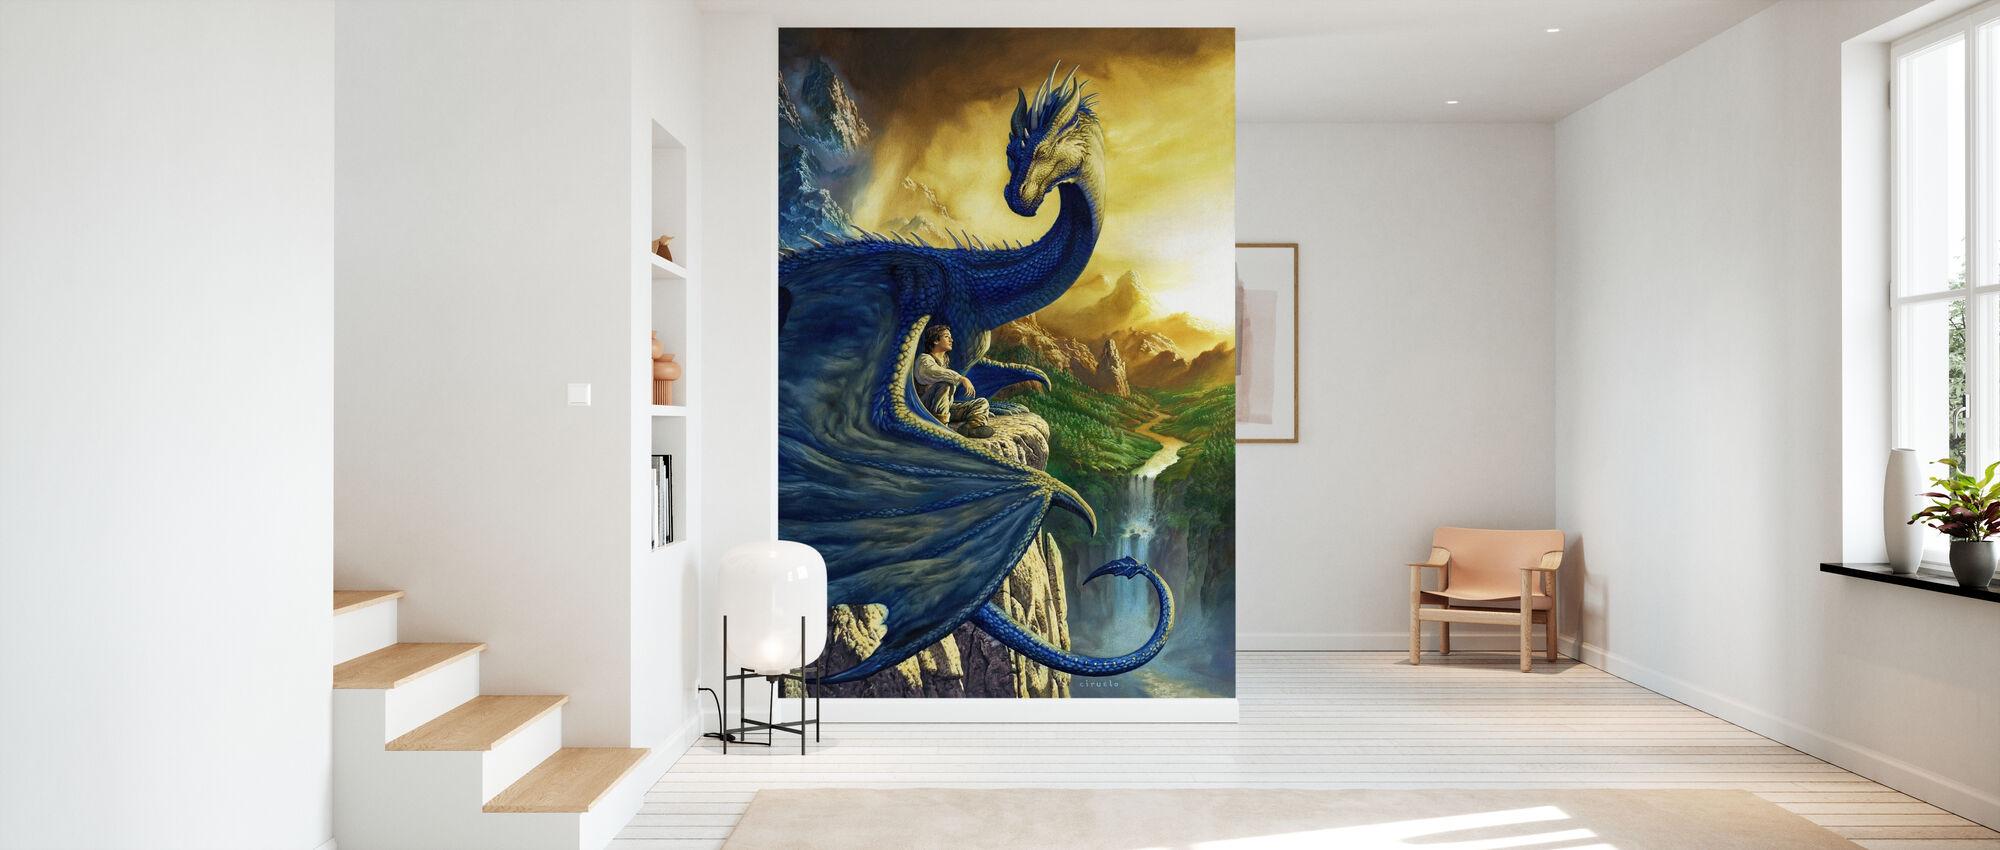 Eragon - Wallpaper - Hallway